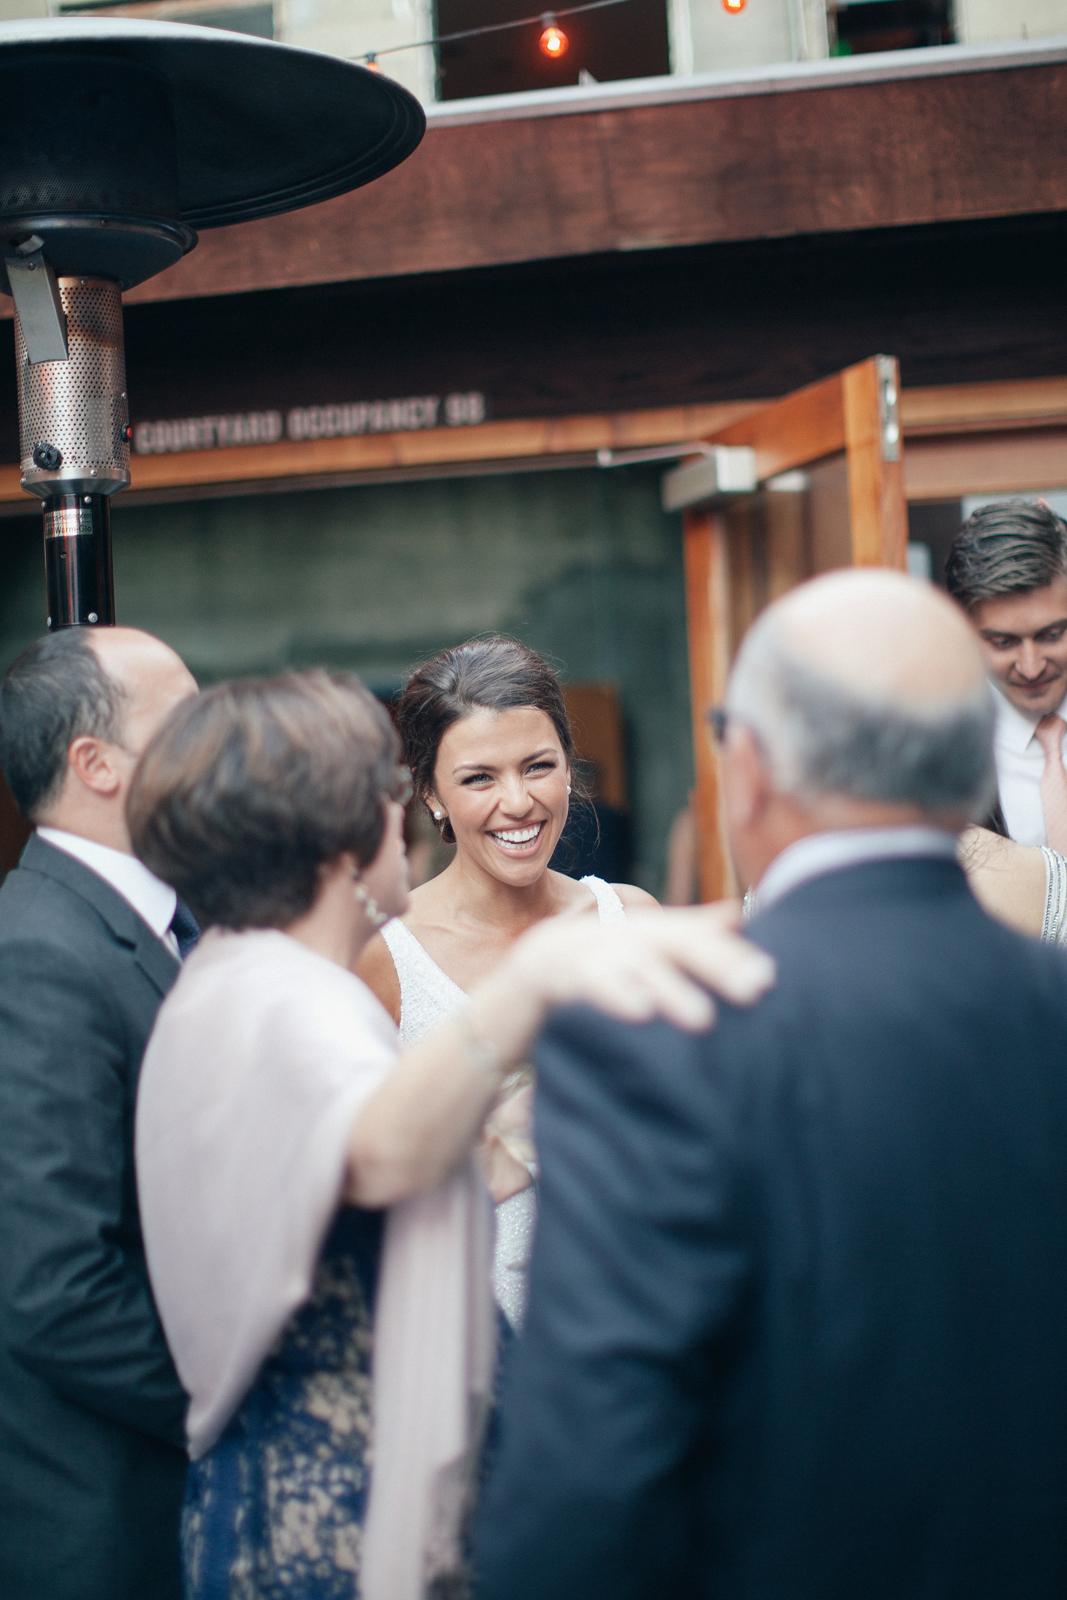 temple_emmanuel_jewish_wedding_san_francisco_ca_sarah_andrew_ebony_siovhan_bokeh_photography_73.jpg